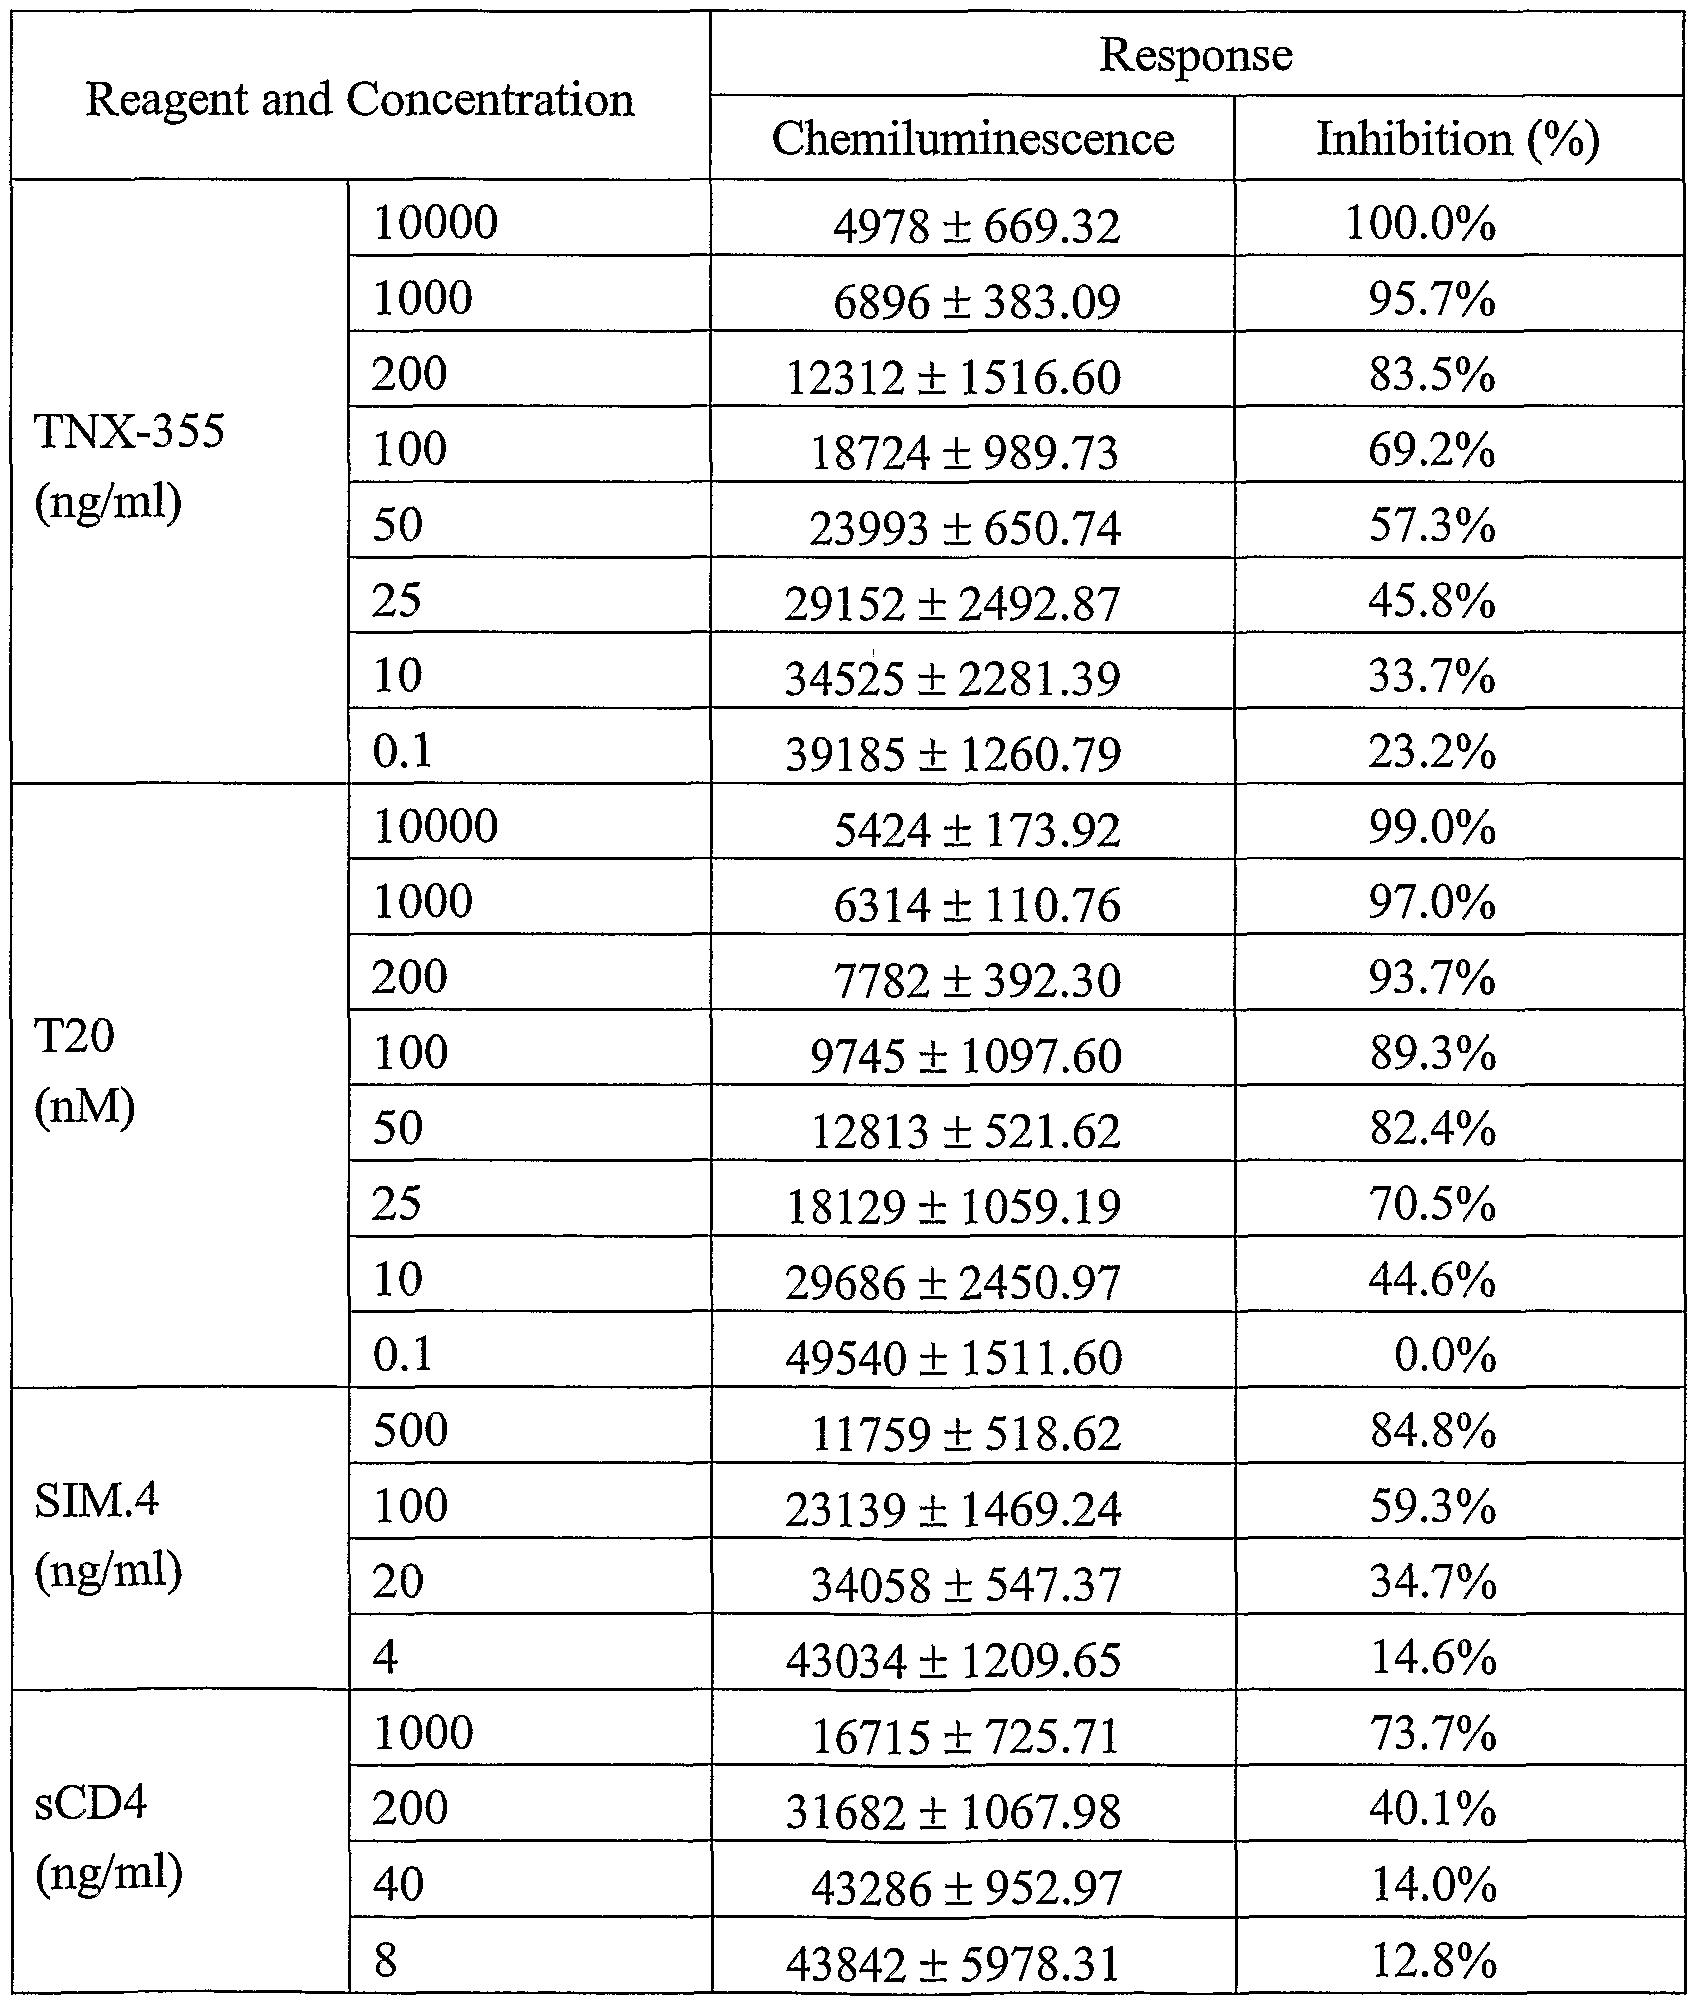 WO2005054272A2 - Human immunodeficiency virus entry inhibitor assay